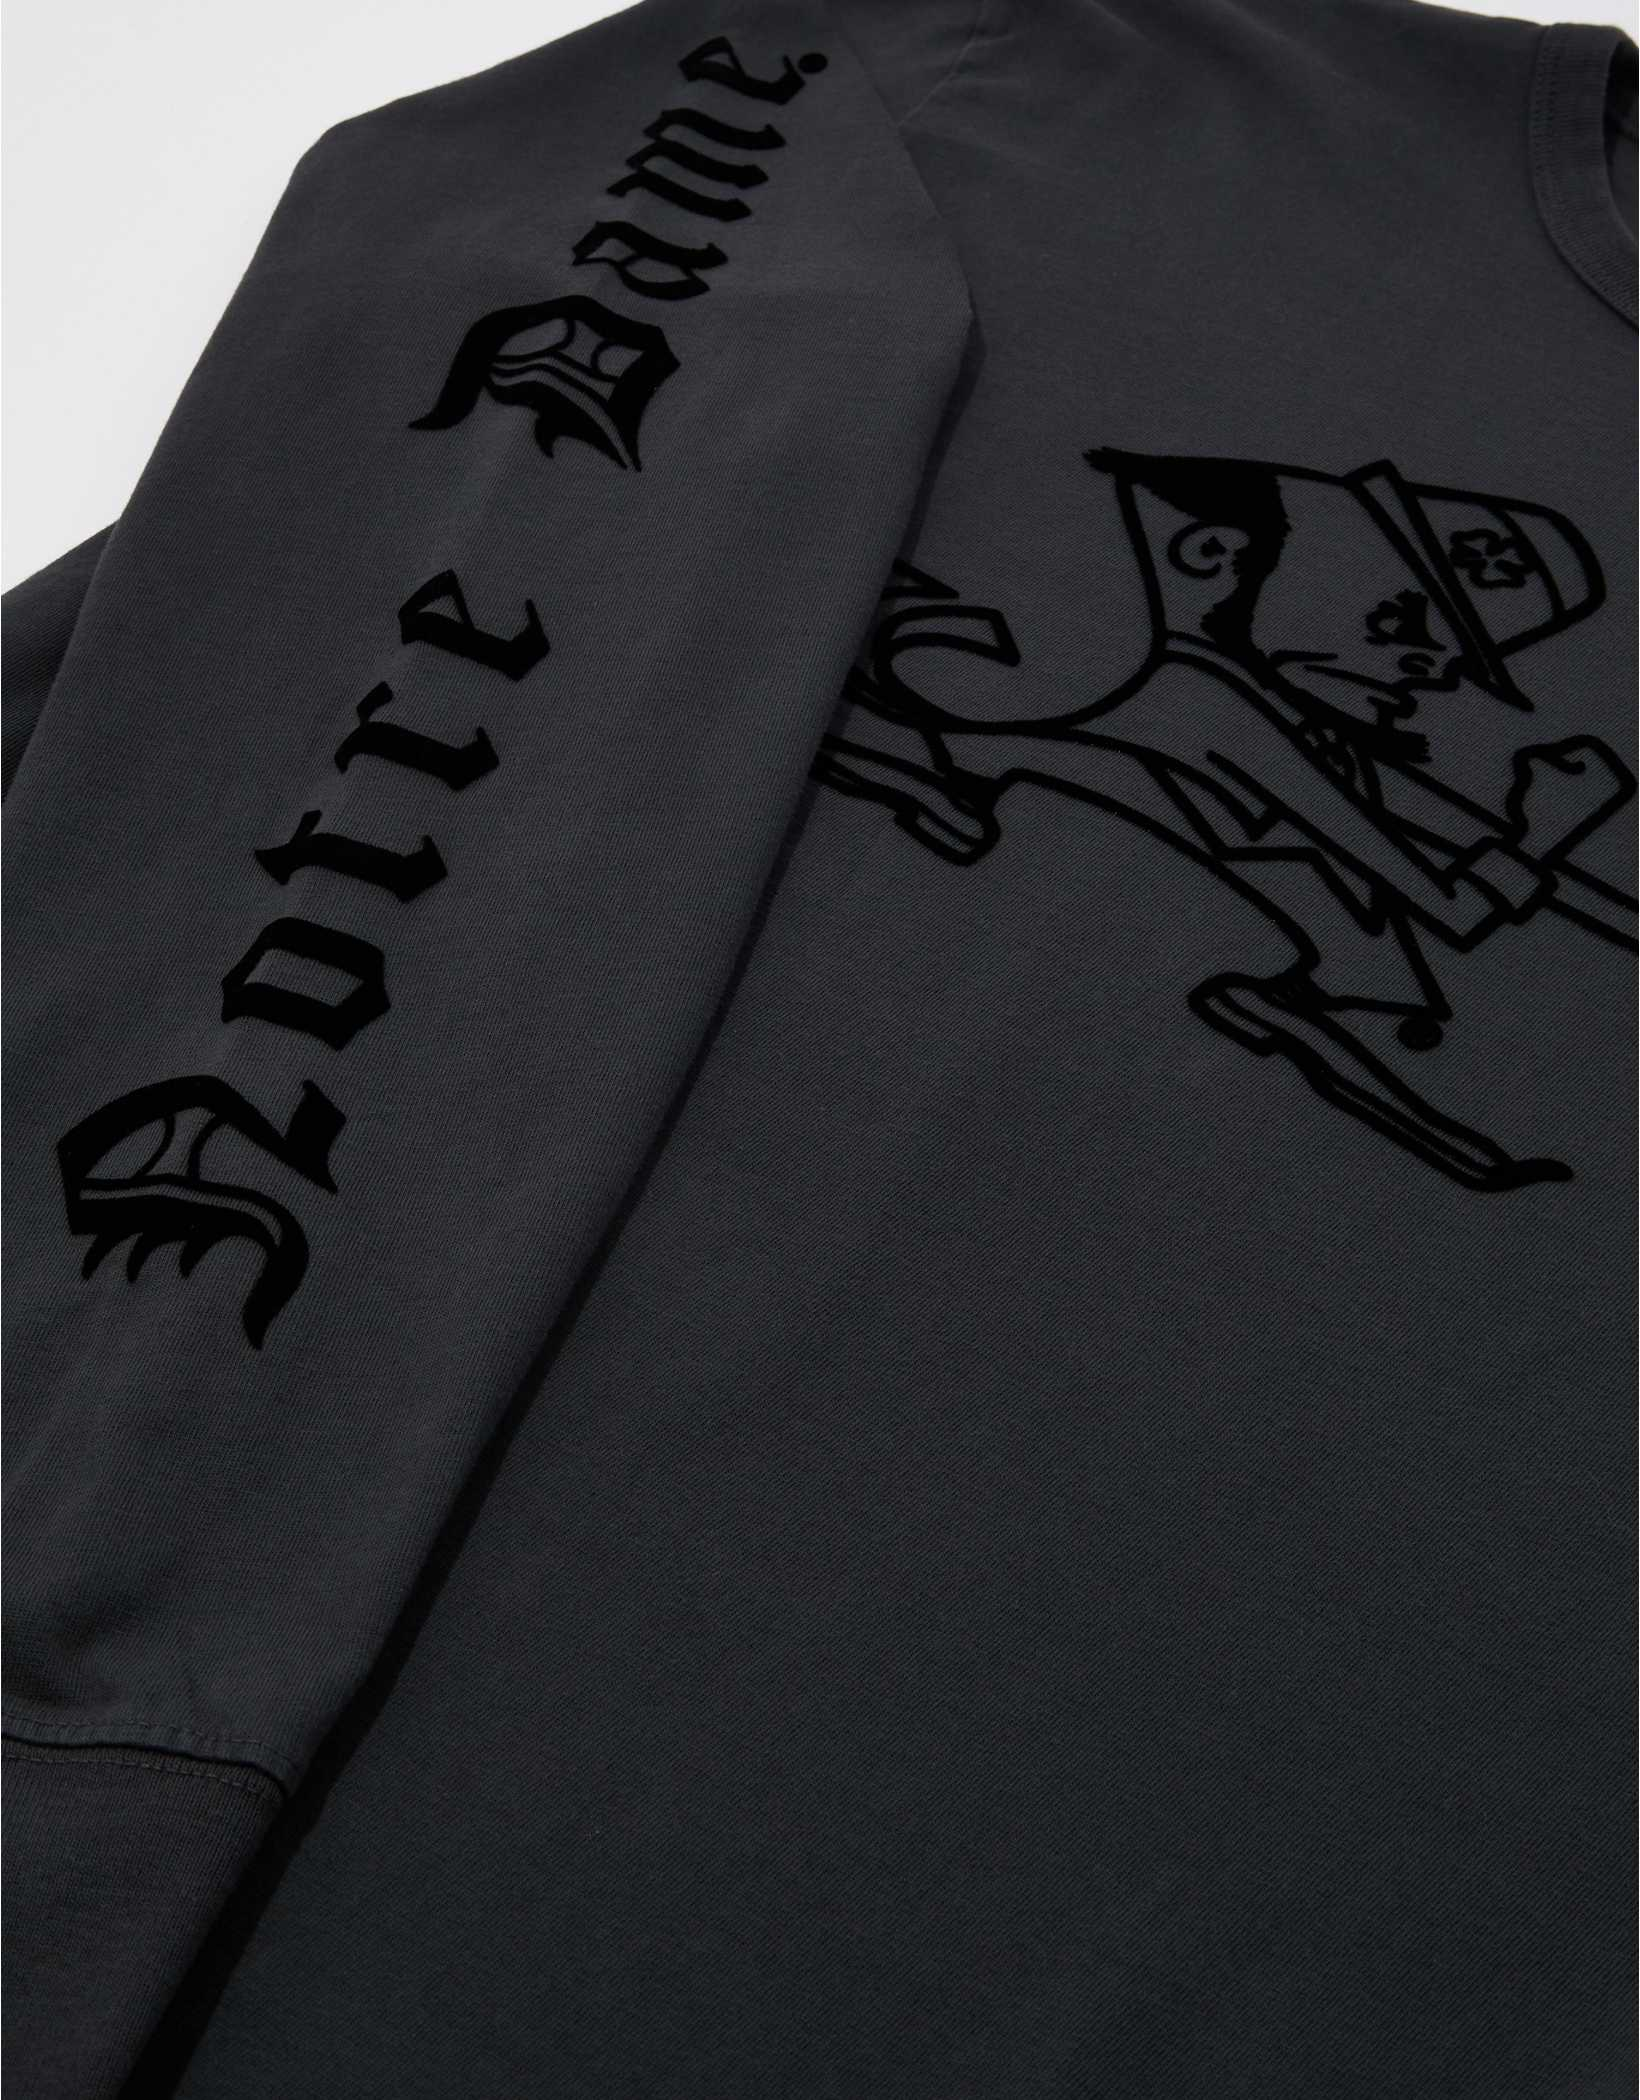 Tailgate Men's Notre Dame Long-Sleeve Tonal T-Shirt